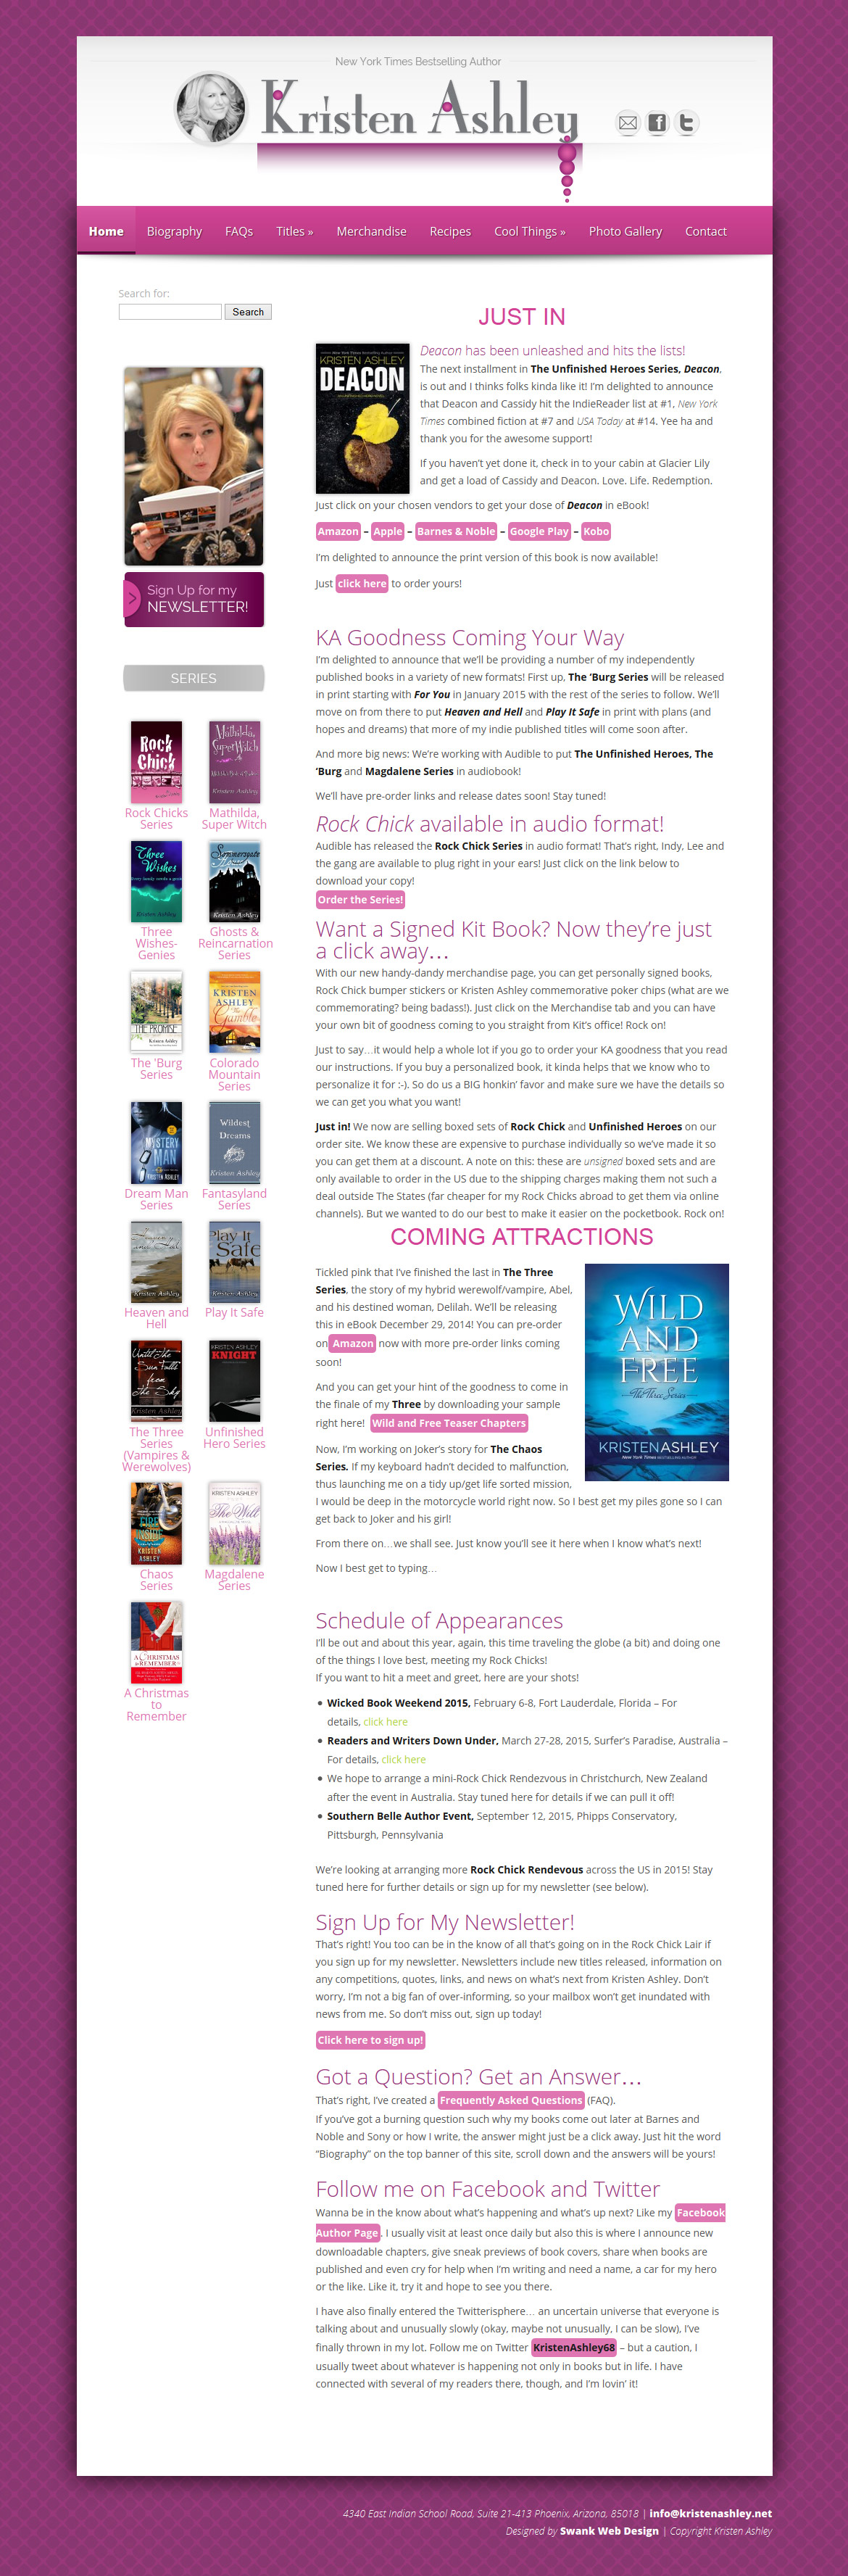 Web Design For Author Kristen Ashley Swank Web Design